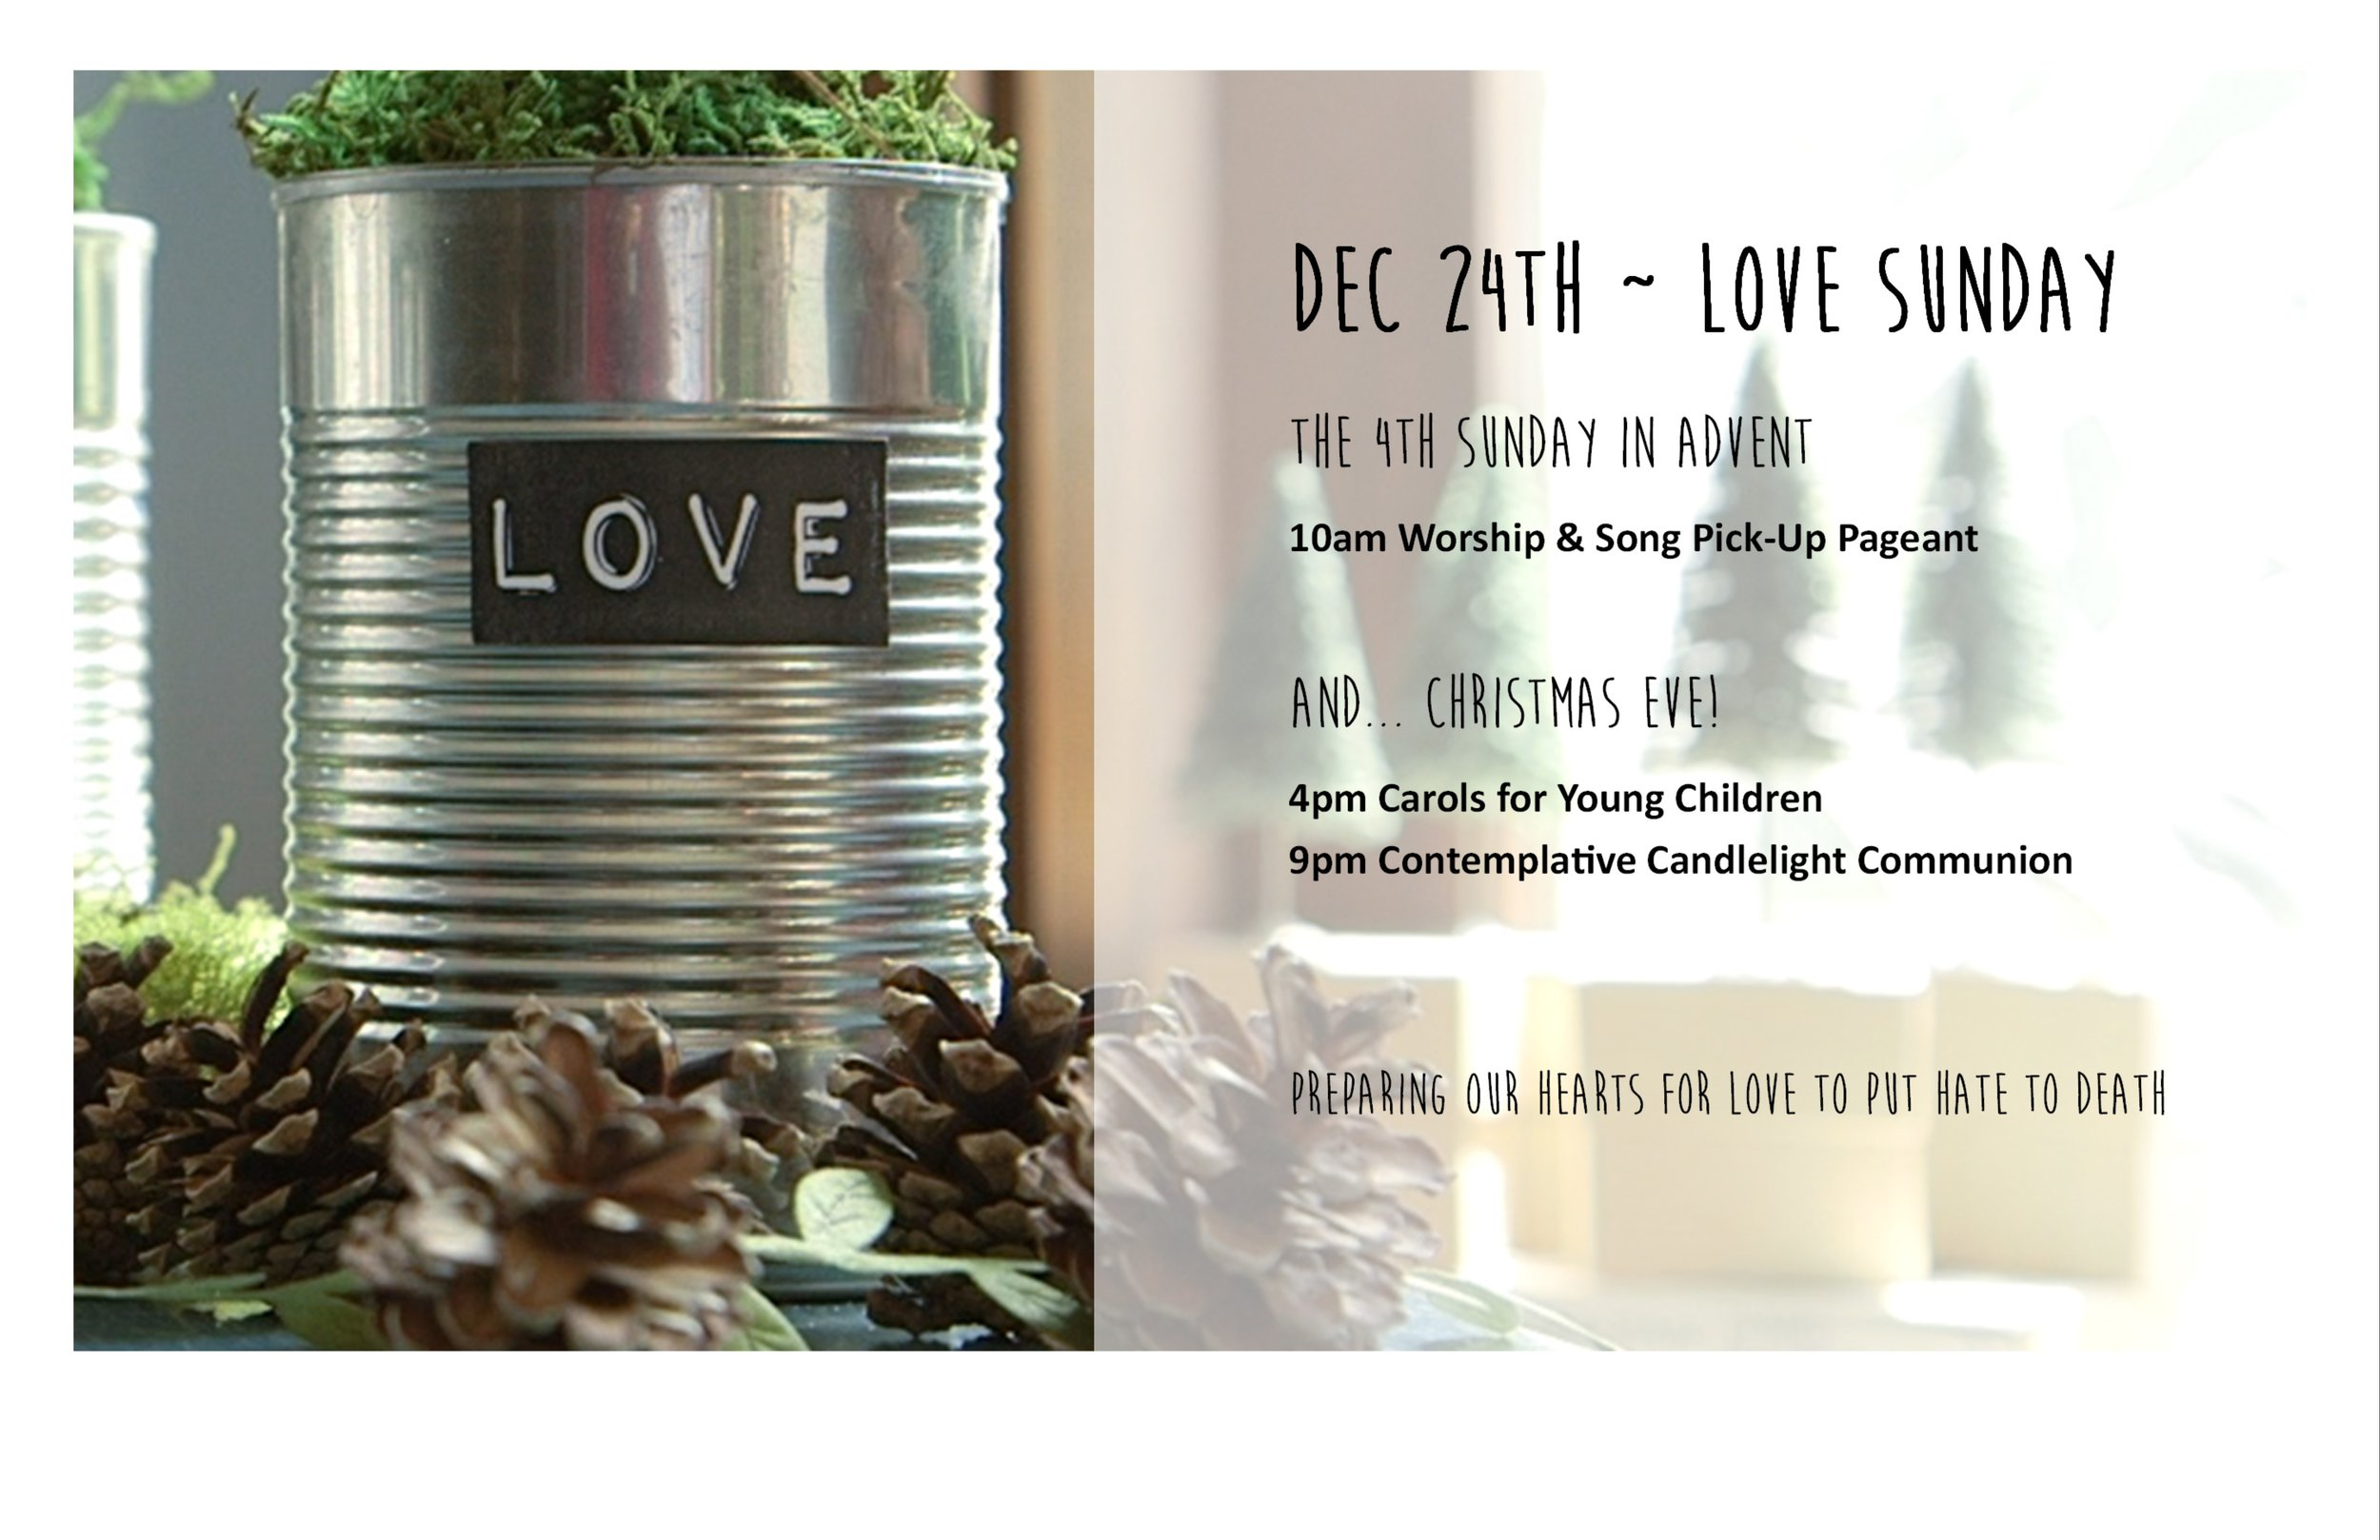 LOVE SUNDAY tin can calendar image 2017.jpg